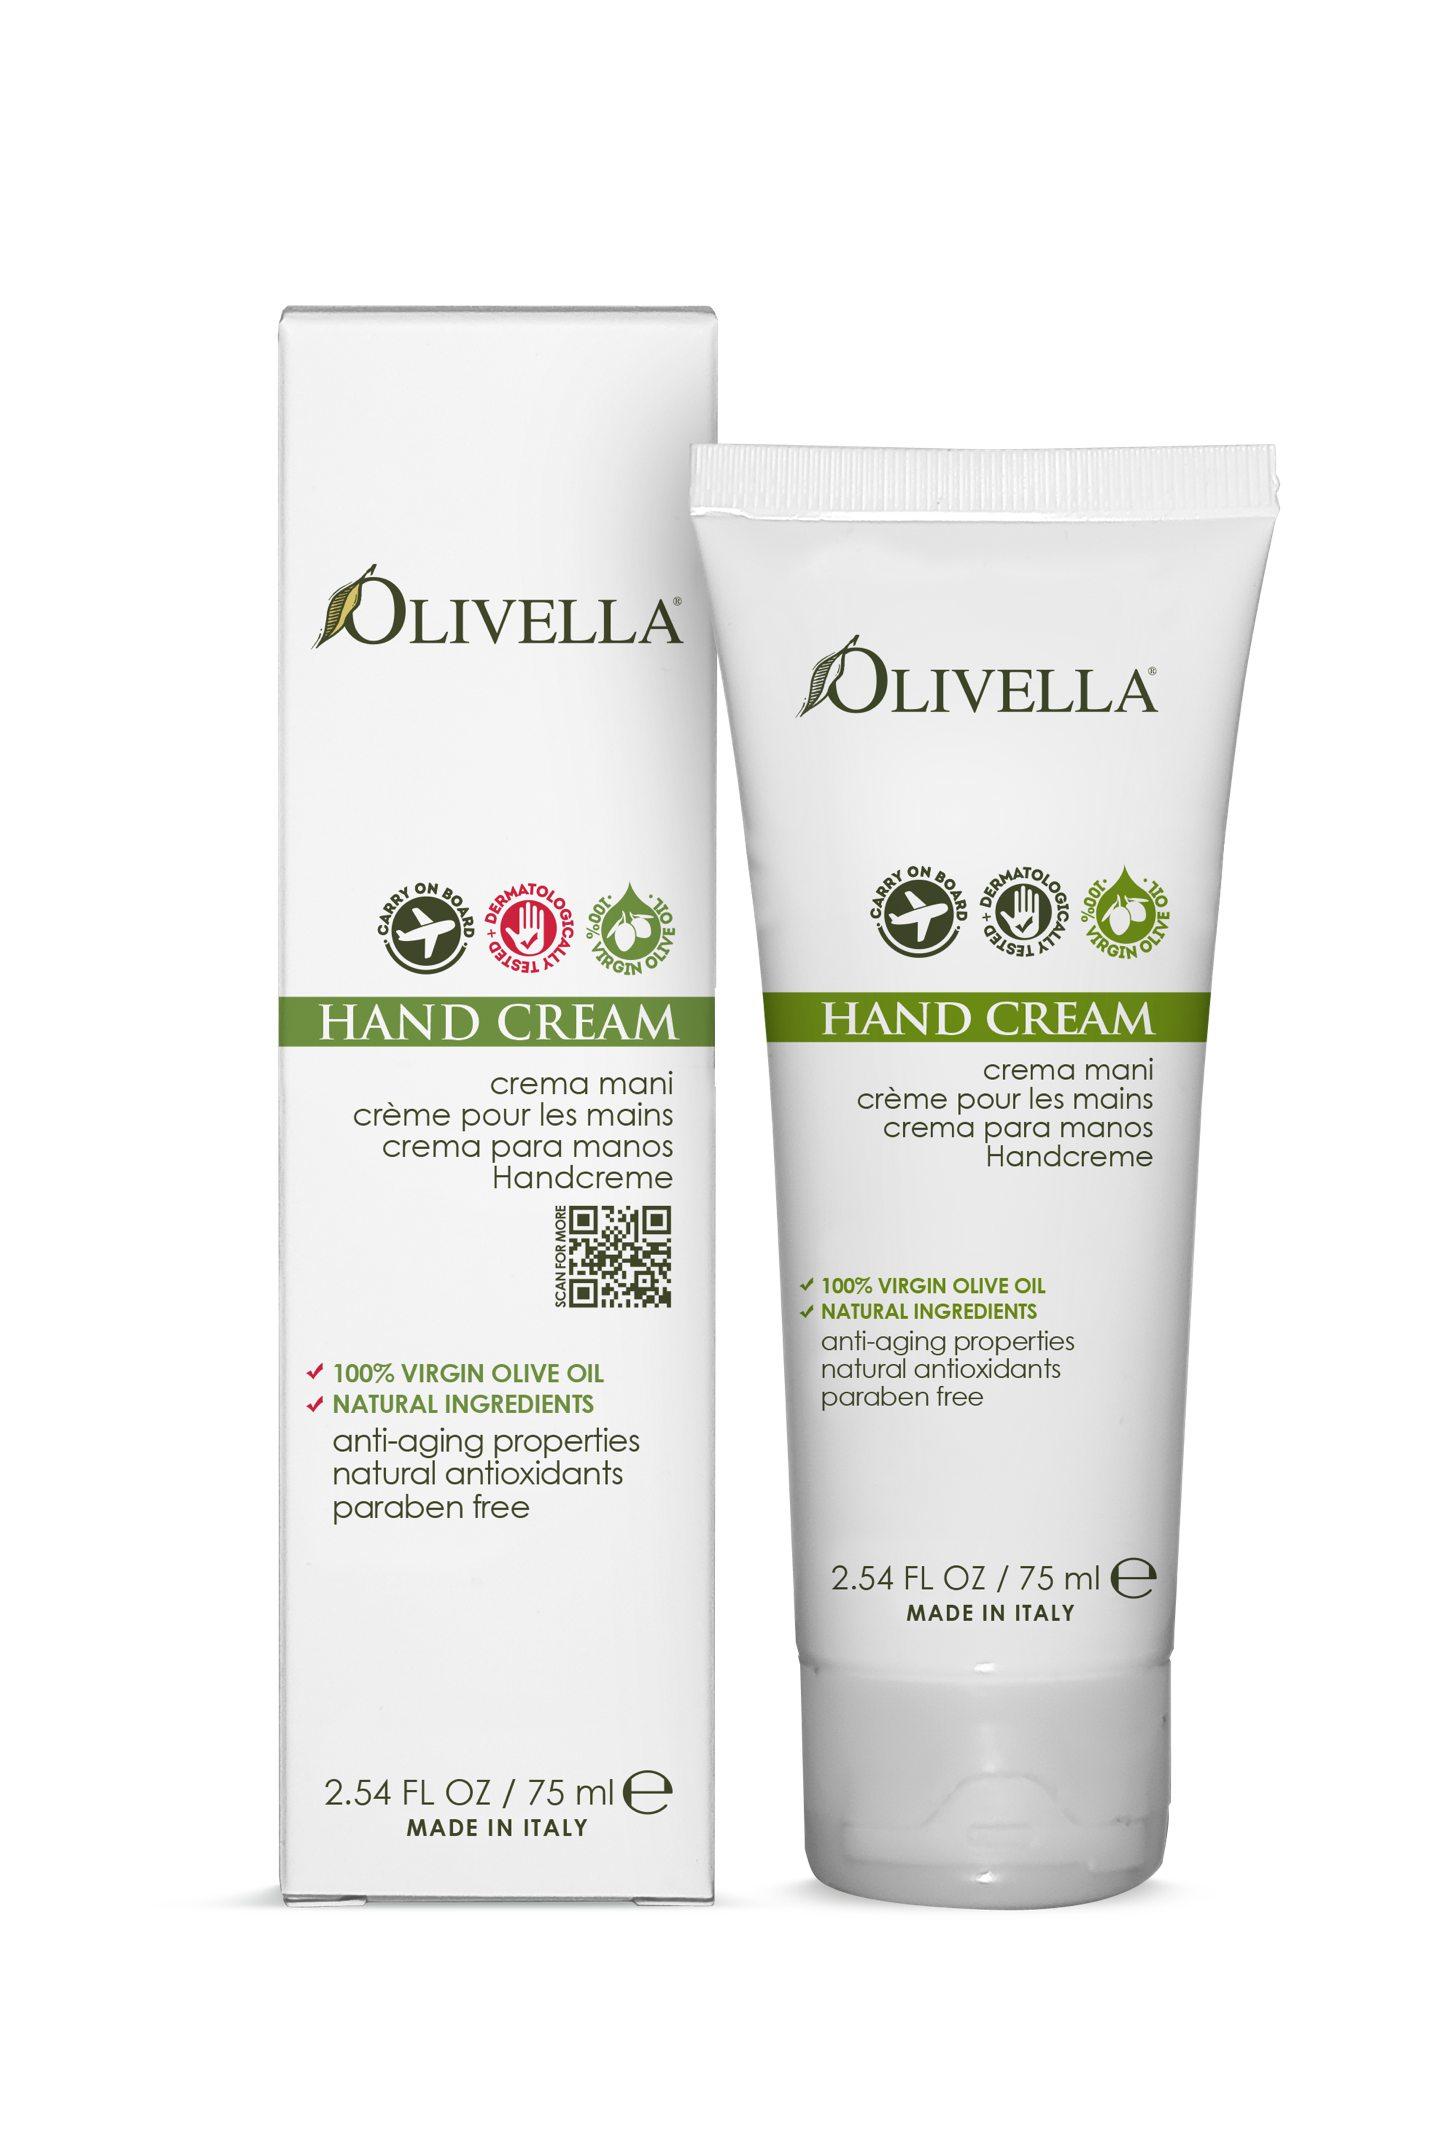 Olivella Hand Cream (tube)